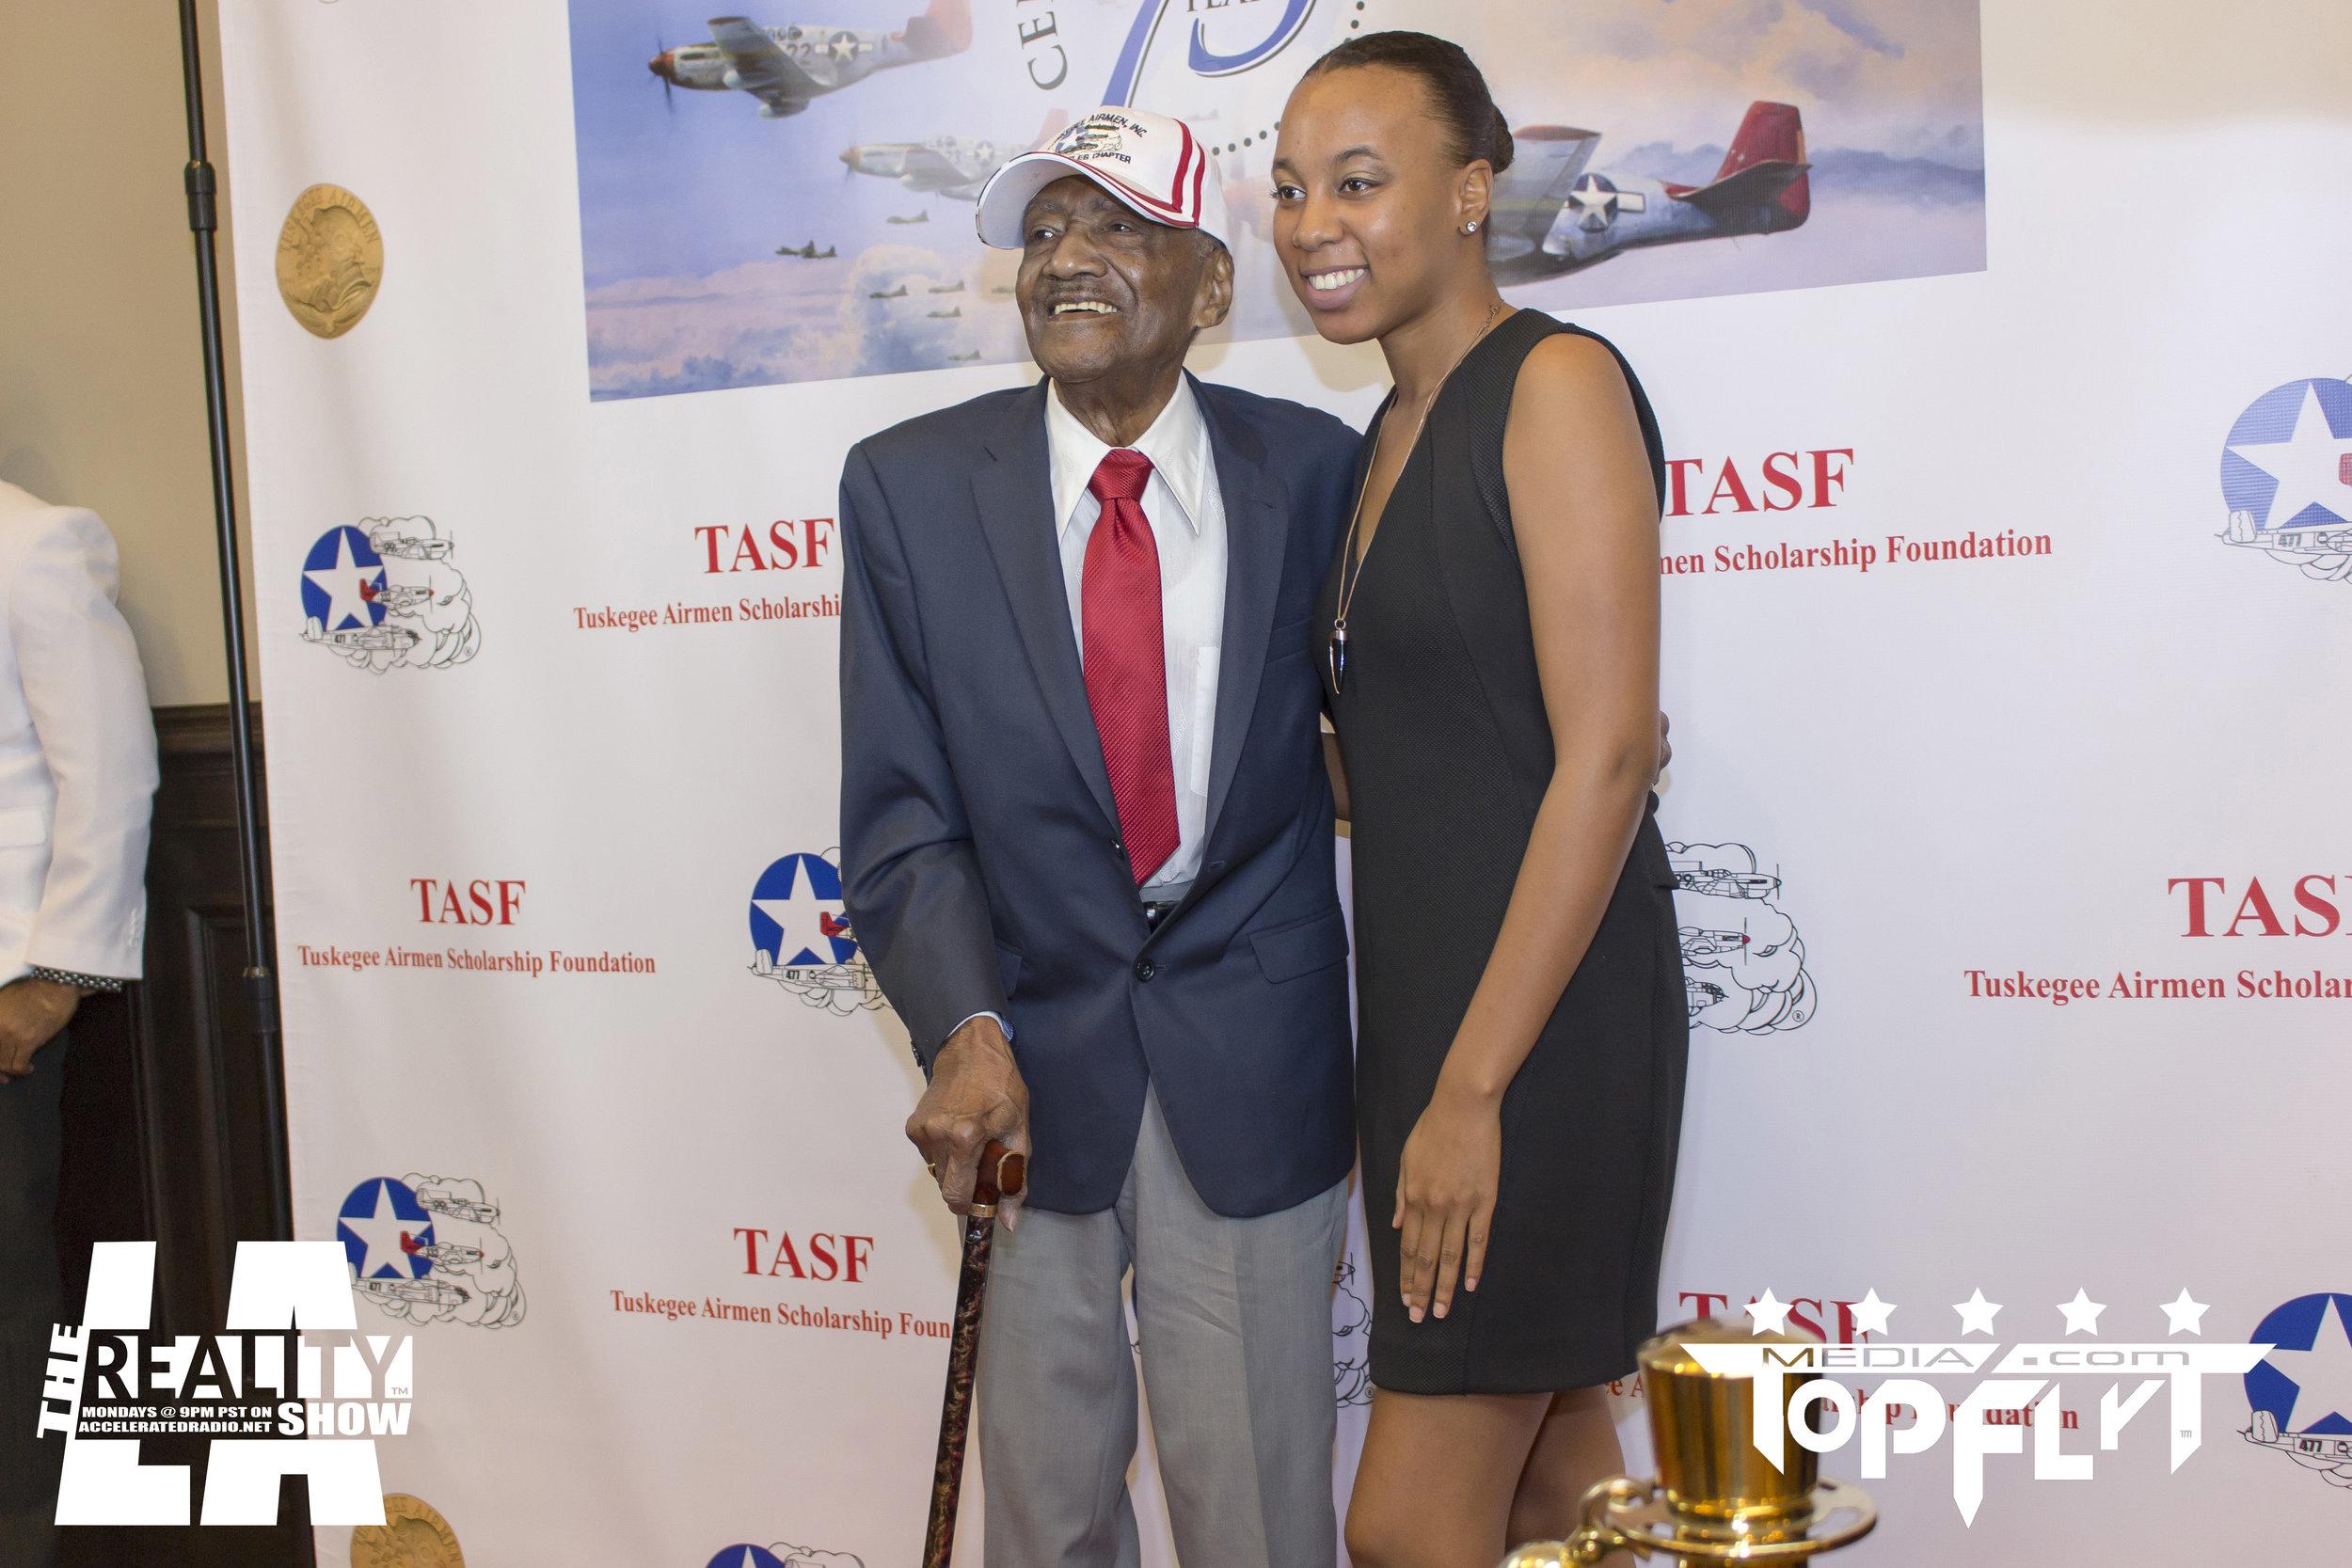 The Reality Show LA - Tuskegee Airmen 75th Anniversary VIP Reception_15.jpg